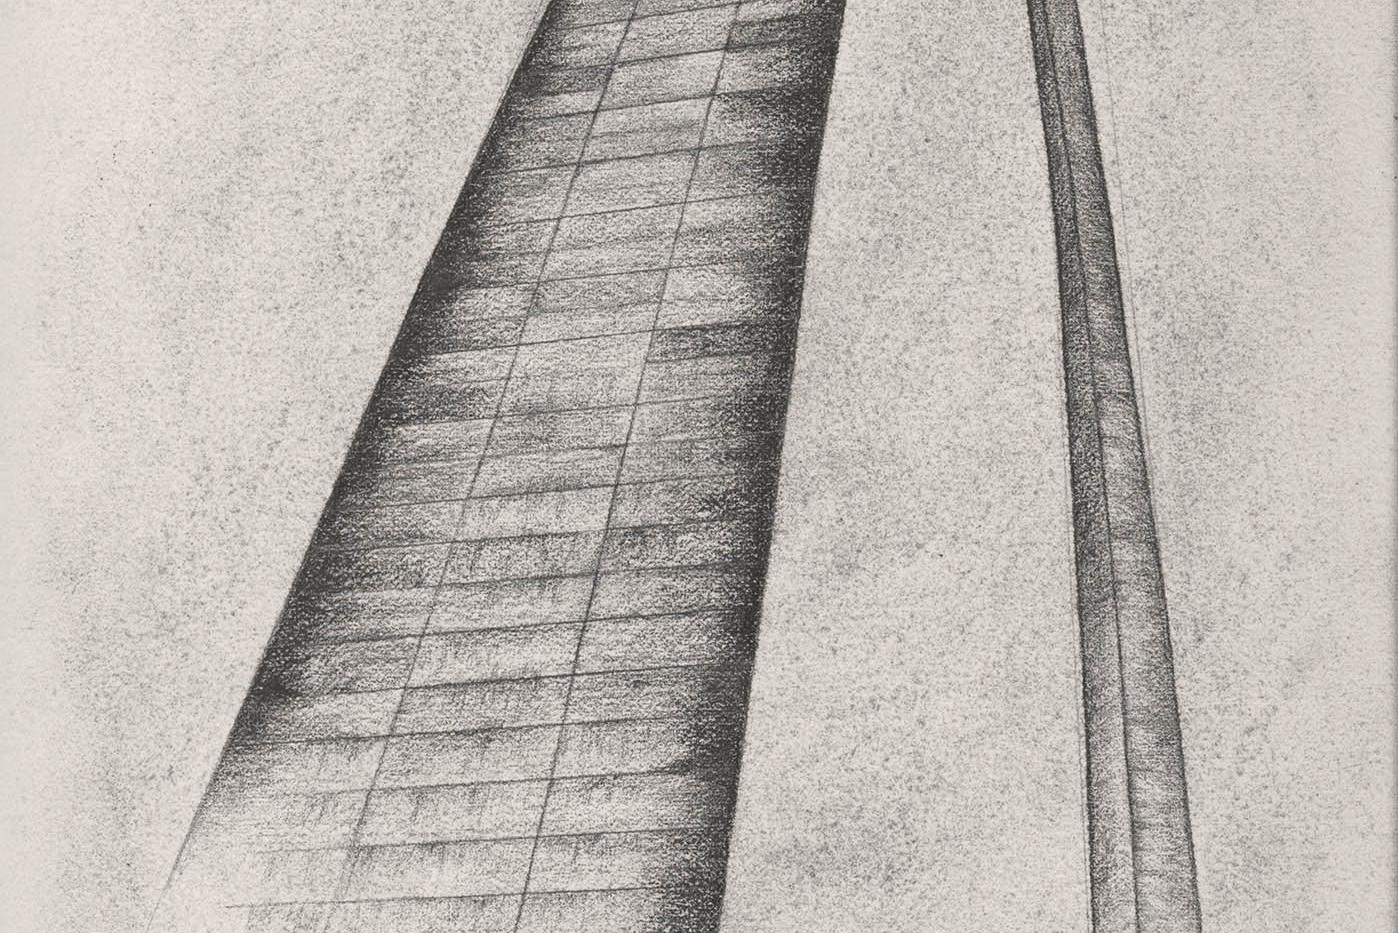 St-Louis-Arch-web.jpg